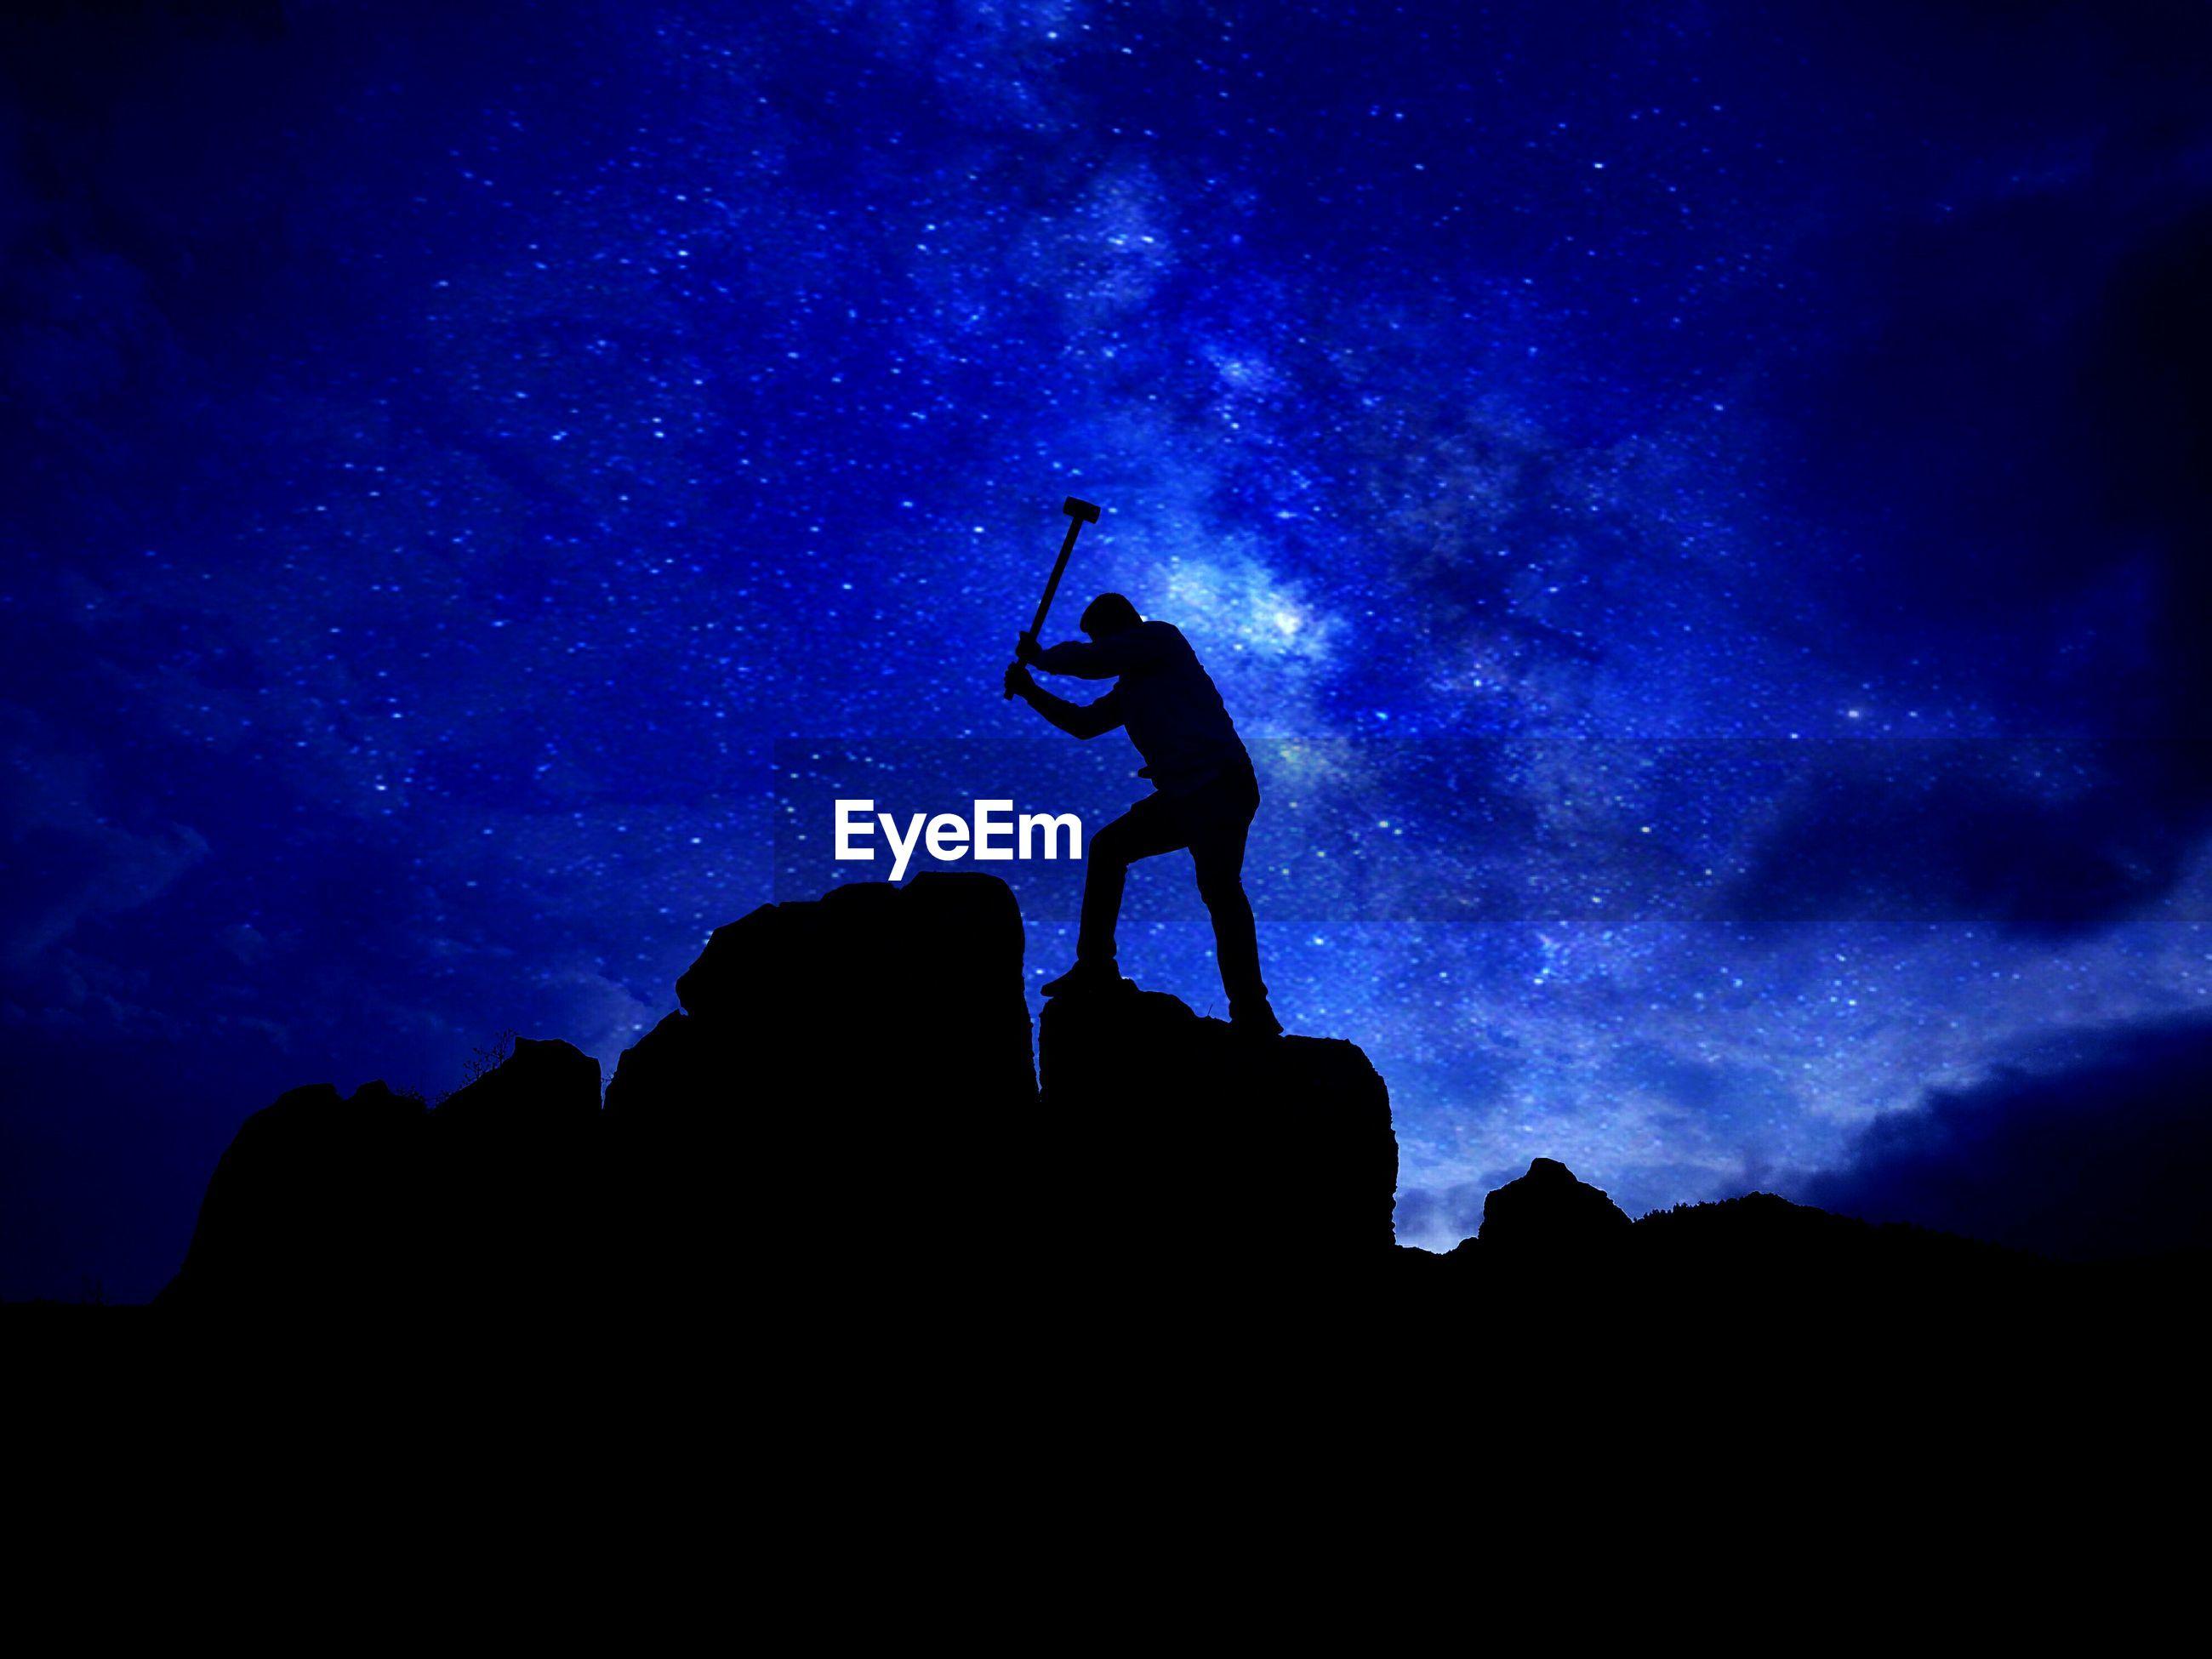 Silhouette man hammering rock against star field at night